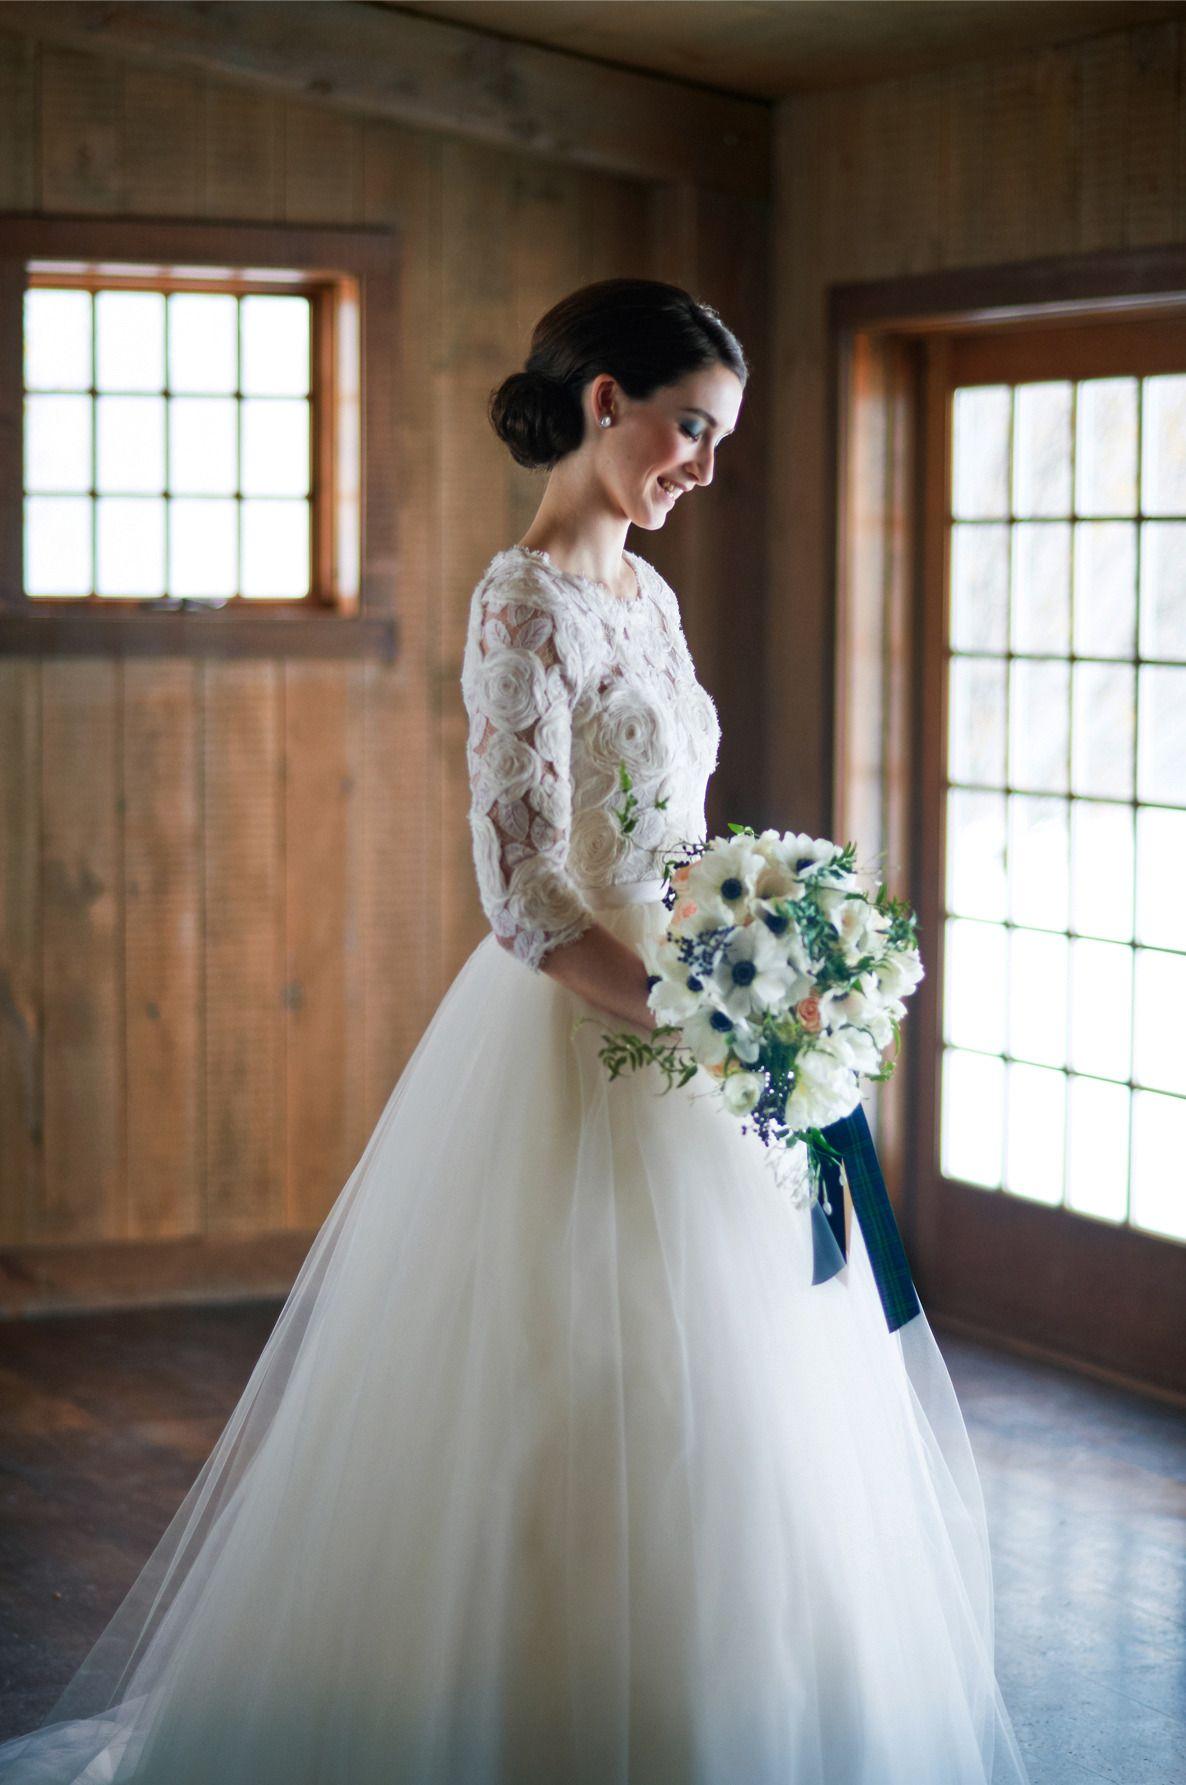 Tartan and Tulle Inspiration Shoot | Wedding, Tulle wedding ...